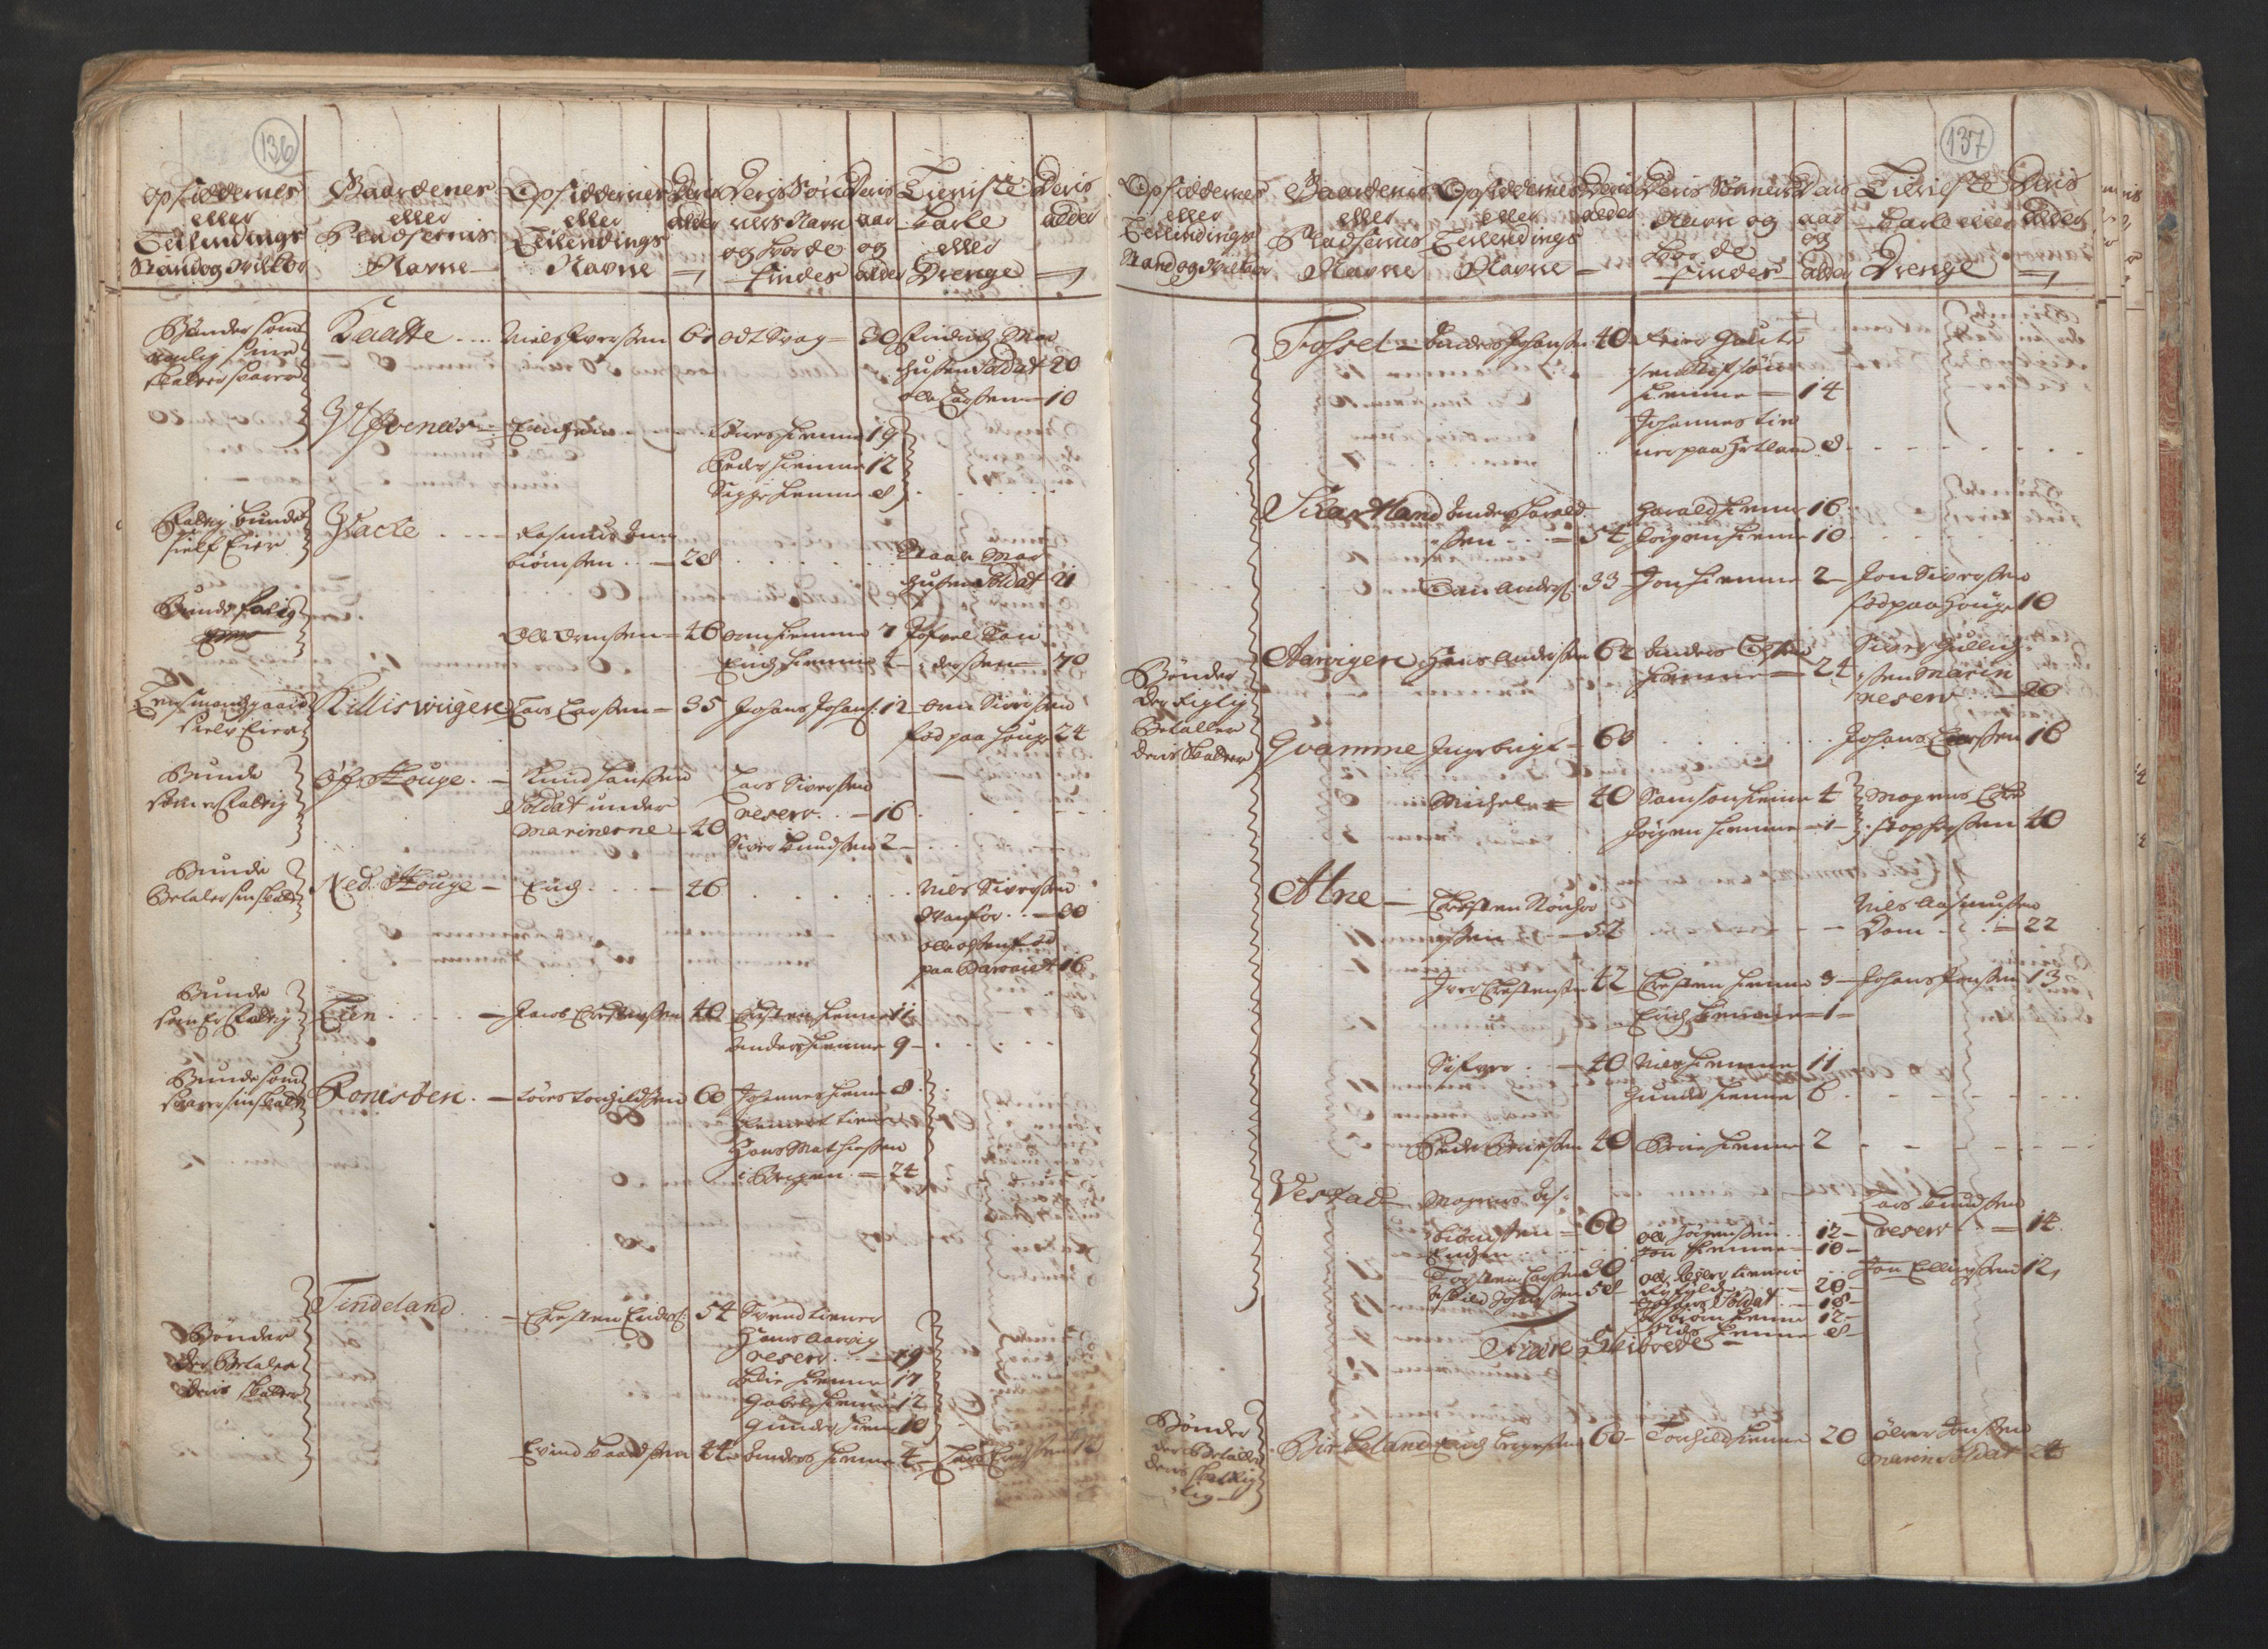 RA, Manntallet 1701, nr. 6: Sunnhordland fogderi og Hardanger fogderi, 1701, s. 136-137